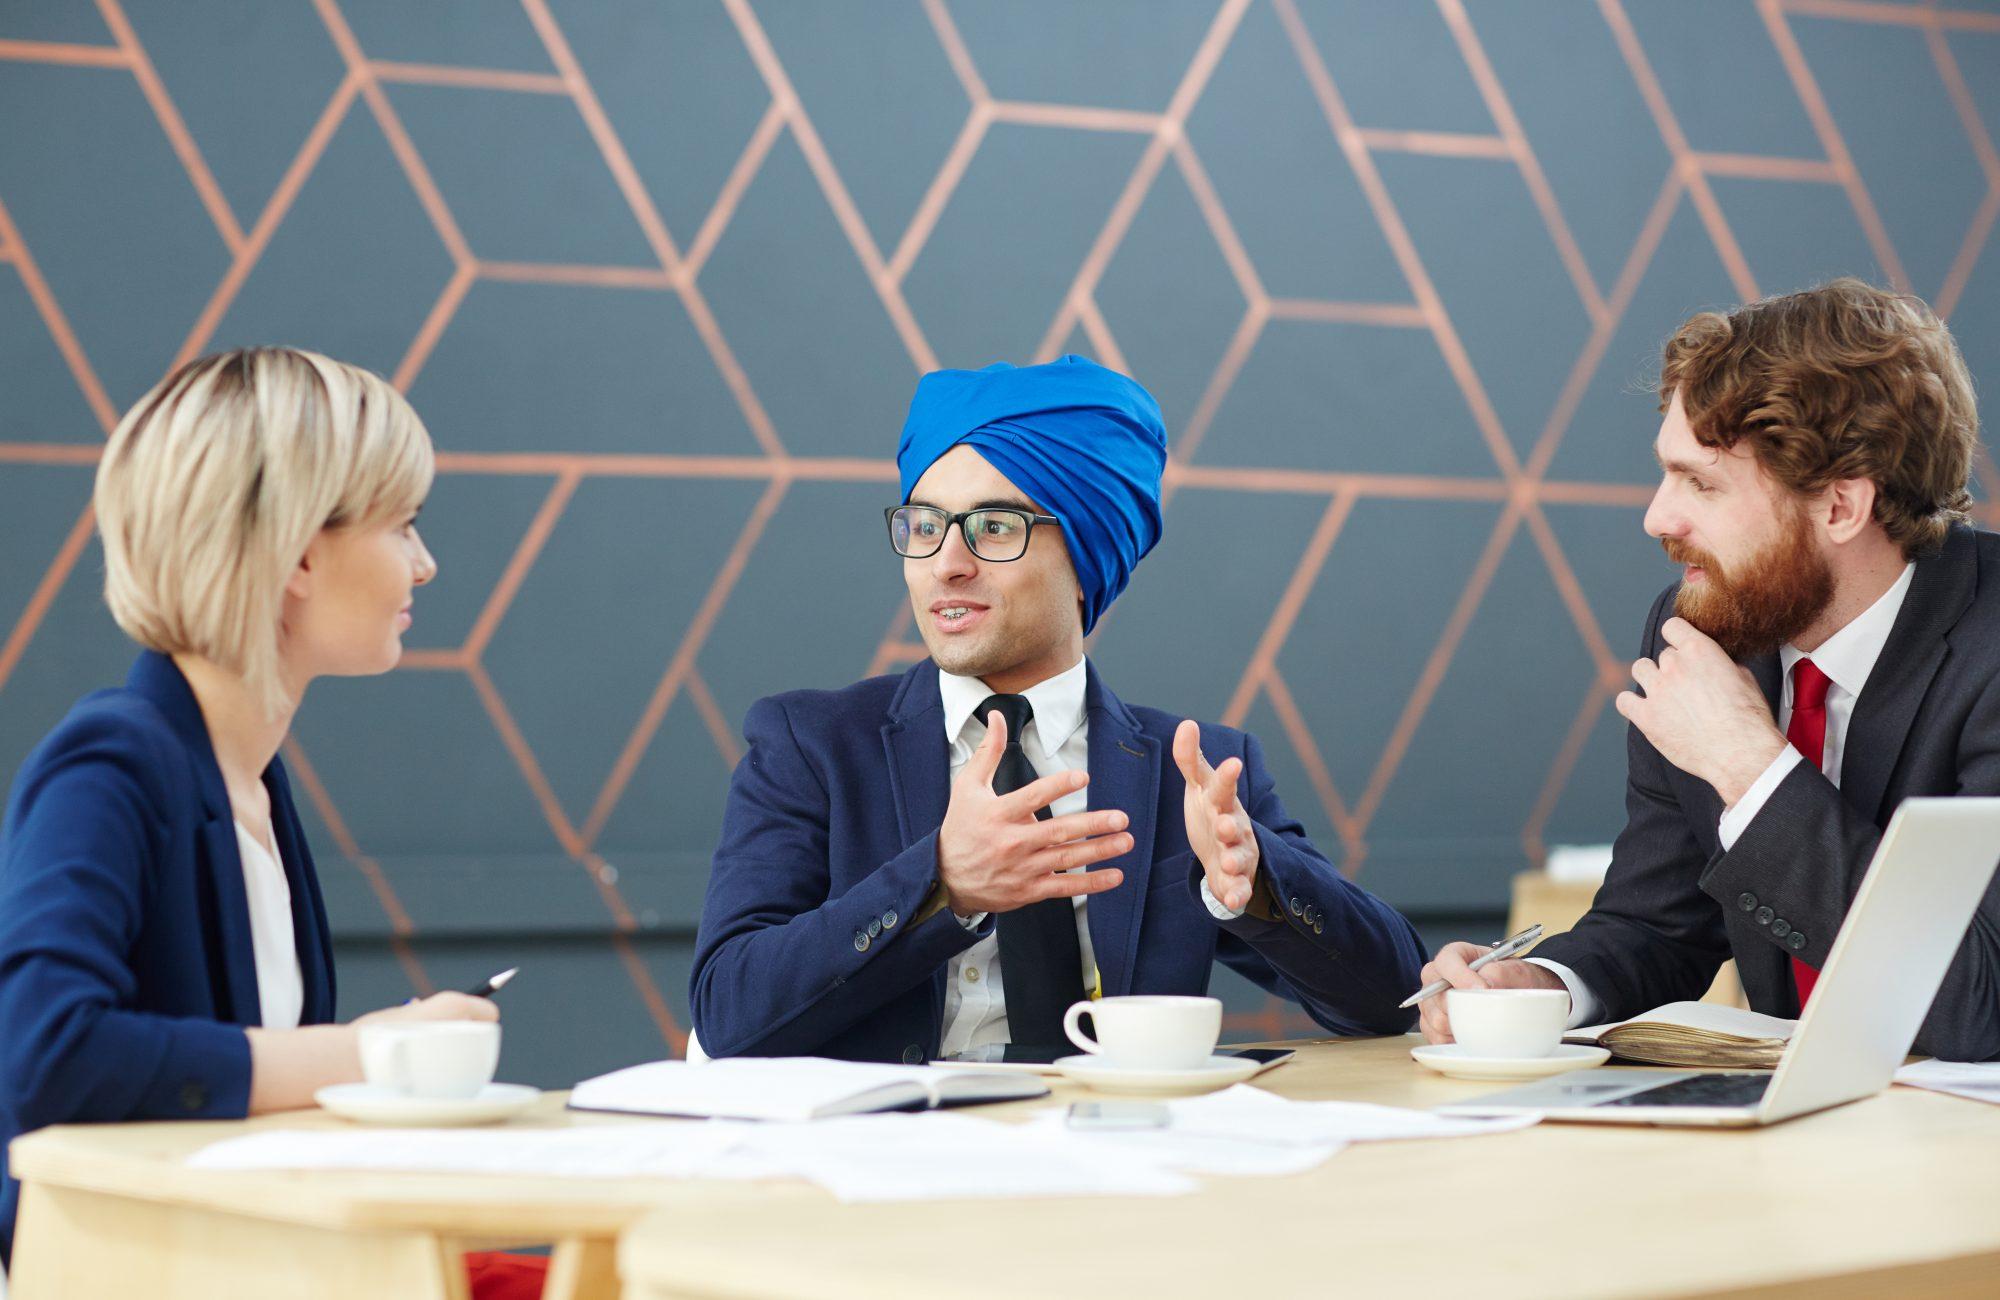 Arabian man in turban giving interview in tv-studio